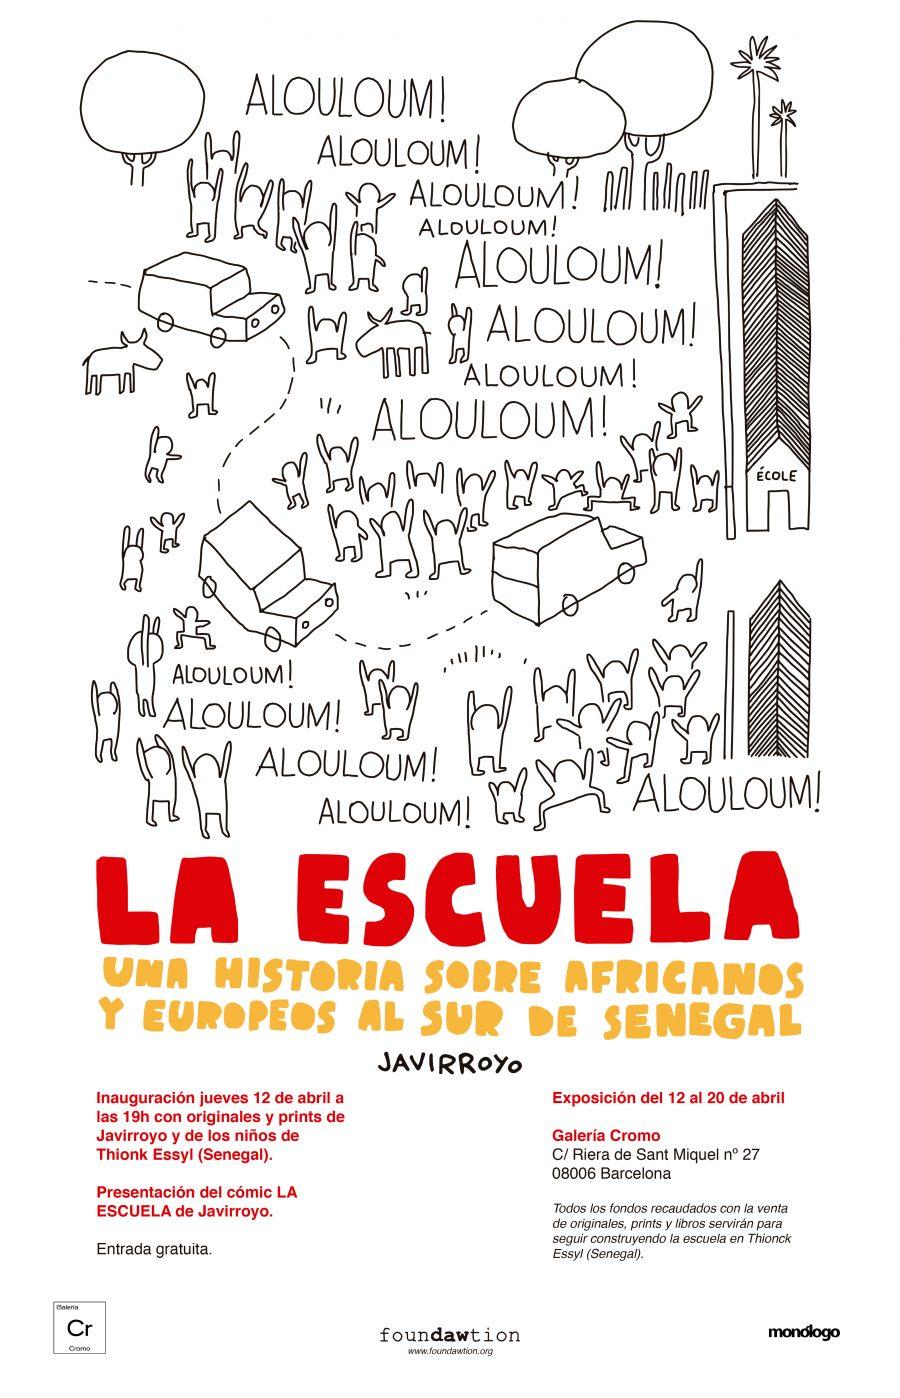 Javi Royo La Escuela Foundawtion Sur de Senegal